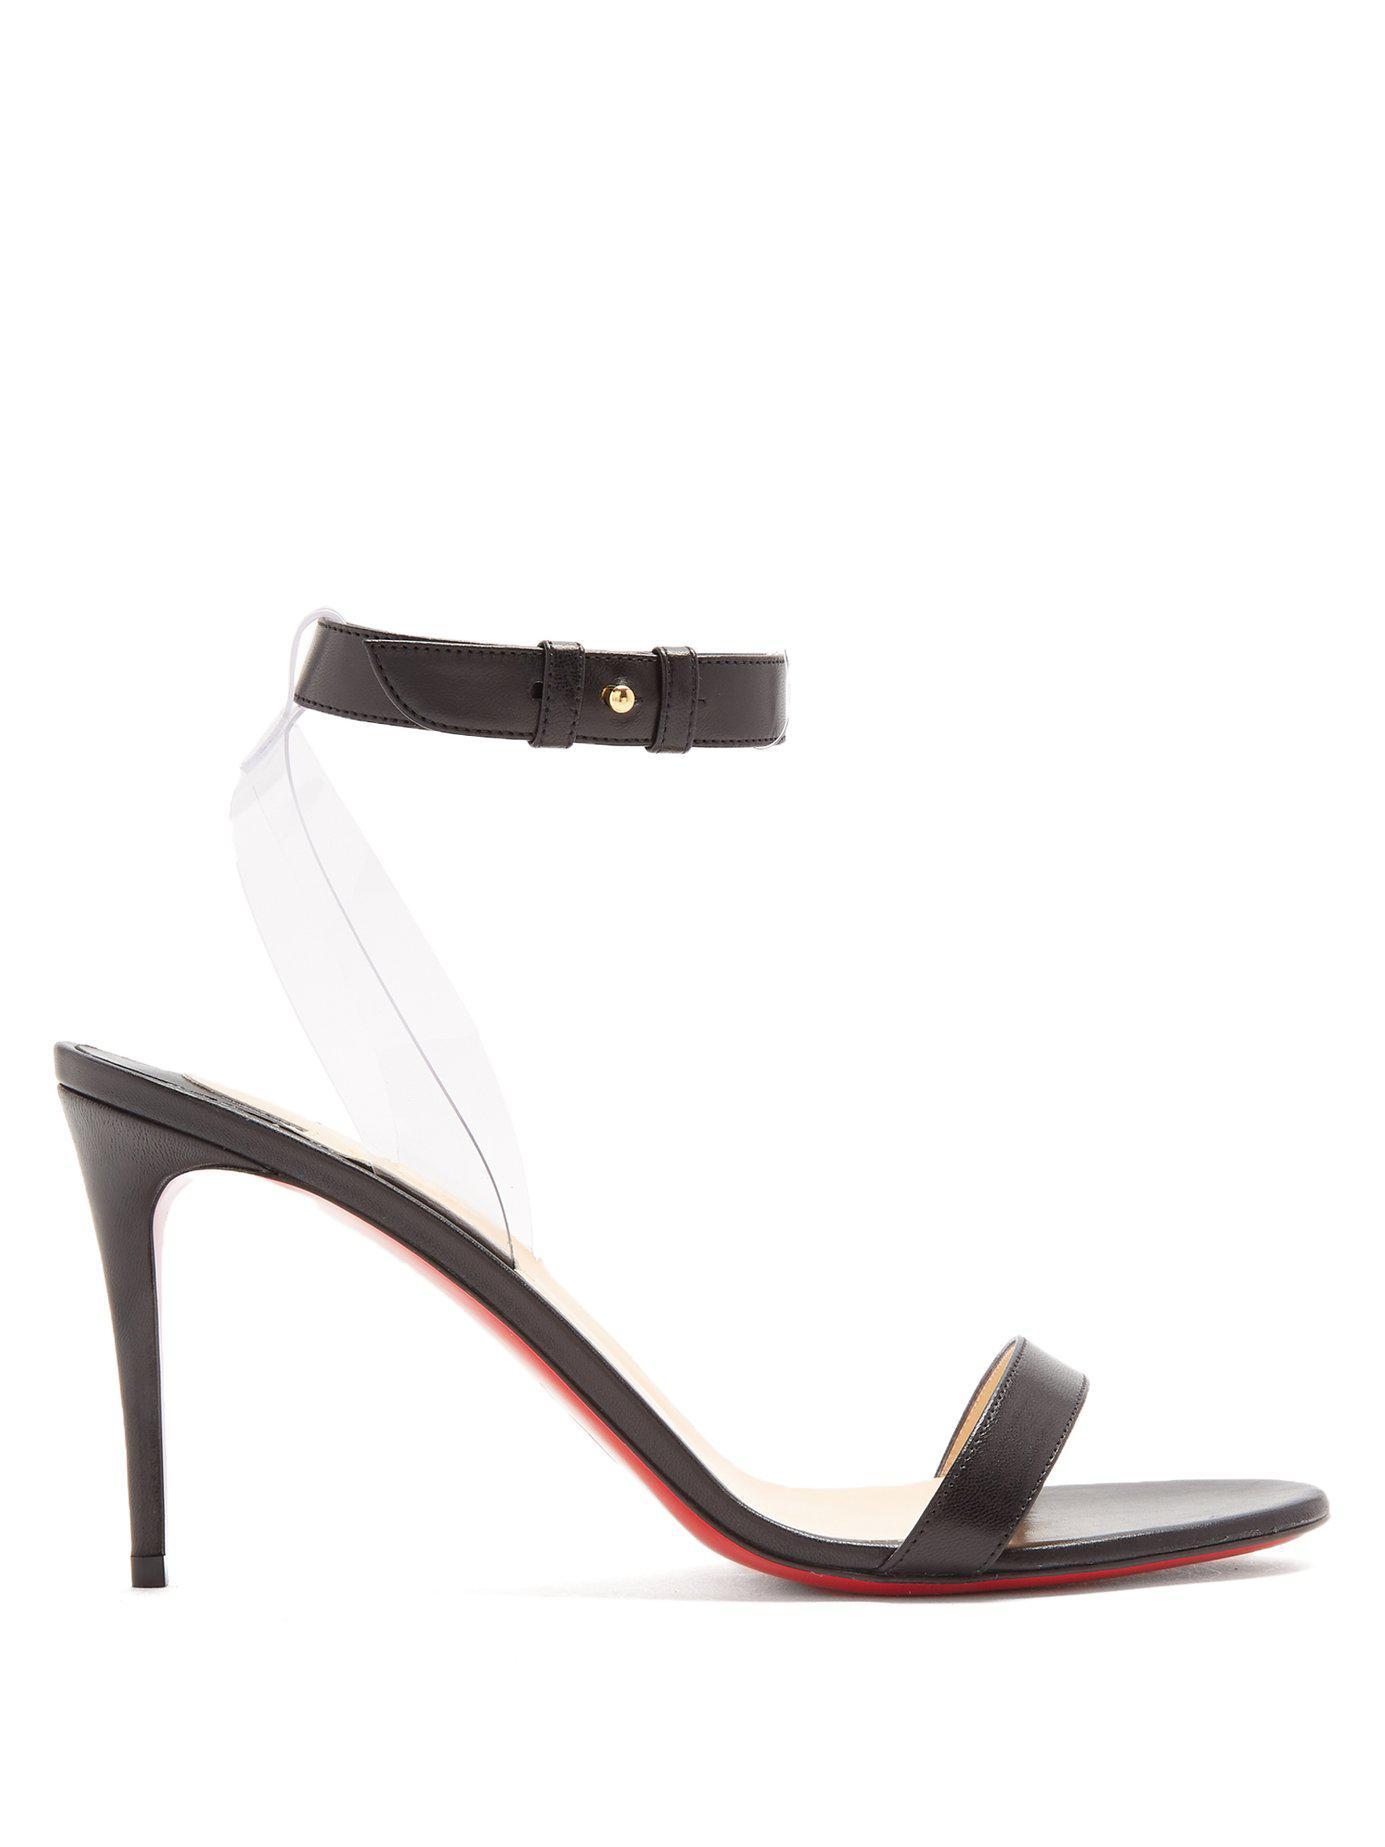 6e077c67038b Lyst - Christian Louboutin Jonatina 85mm Leather Sandals in Black